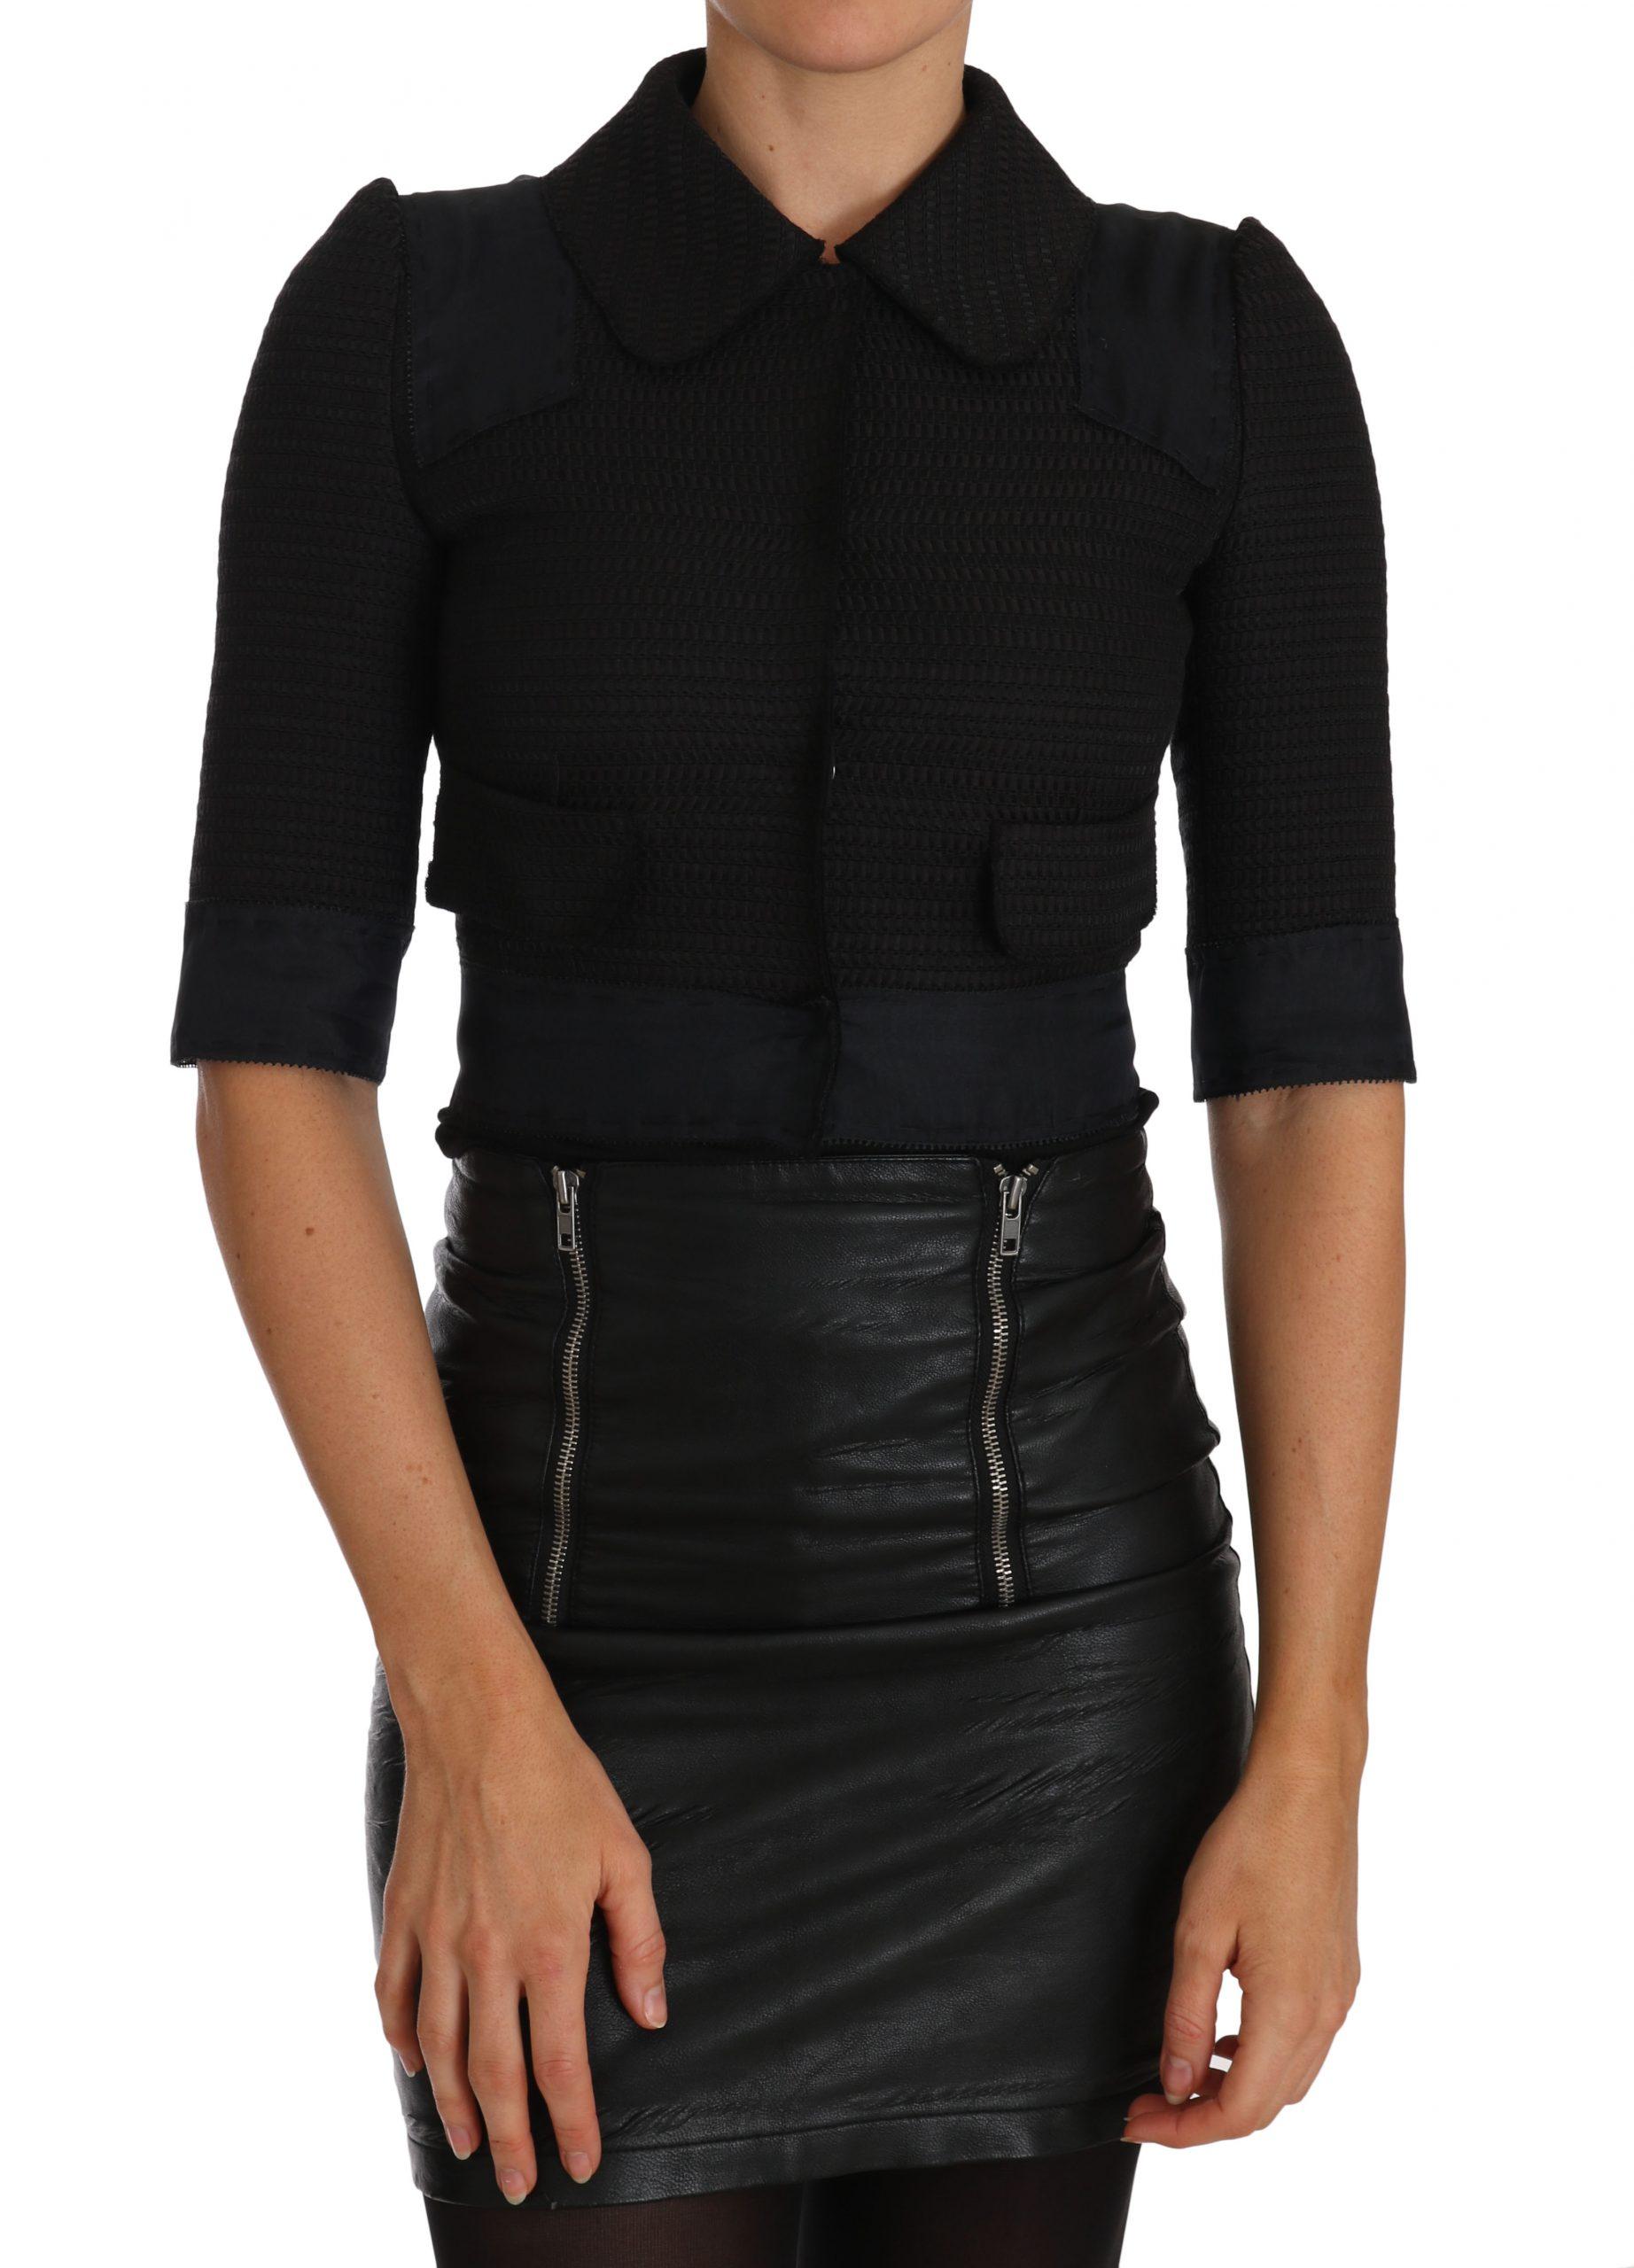 Dolce & Gabbana Women's Short Cropped Blazer Black TSH2296 - IT40 S